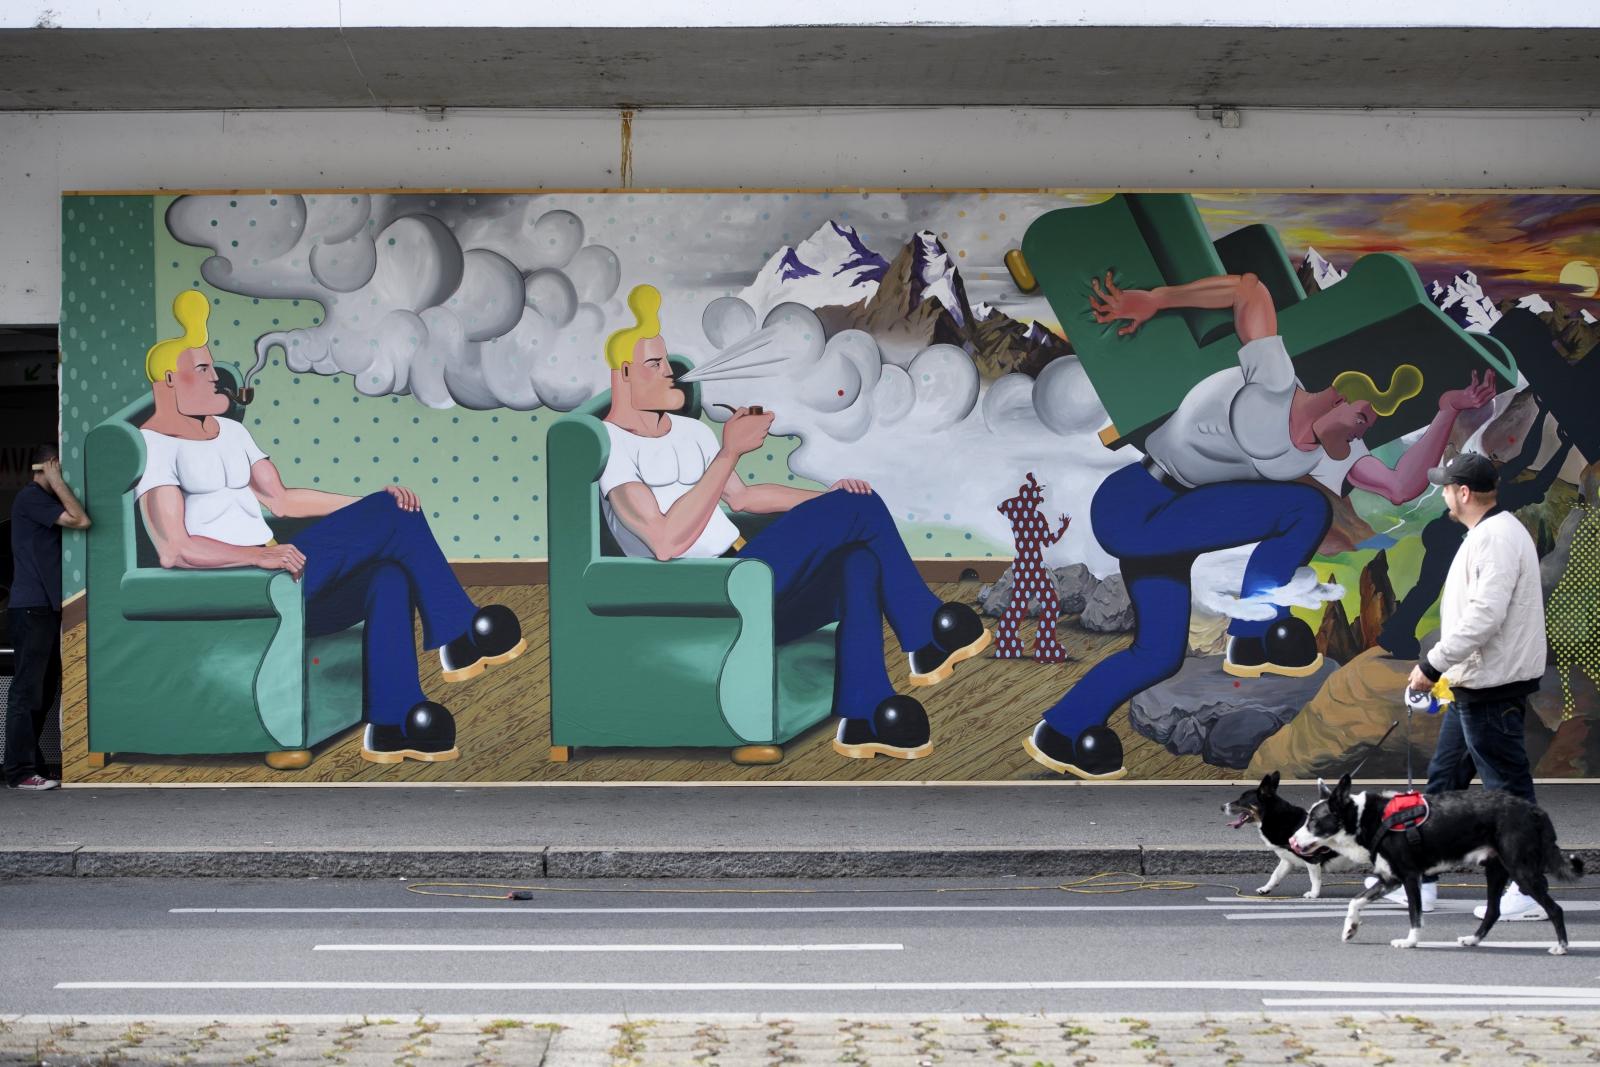 Szwajcaria Faestiwal komiksów EPA/LAURENT GILLIERON